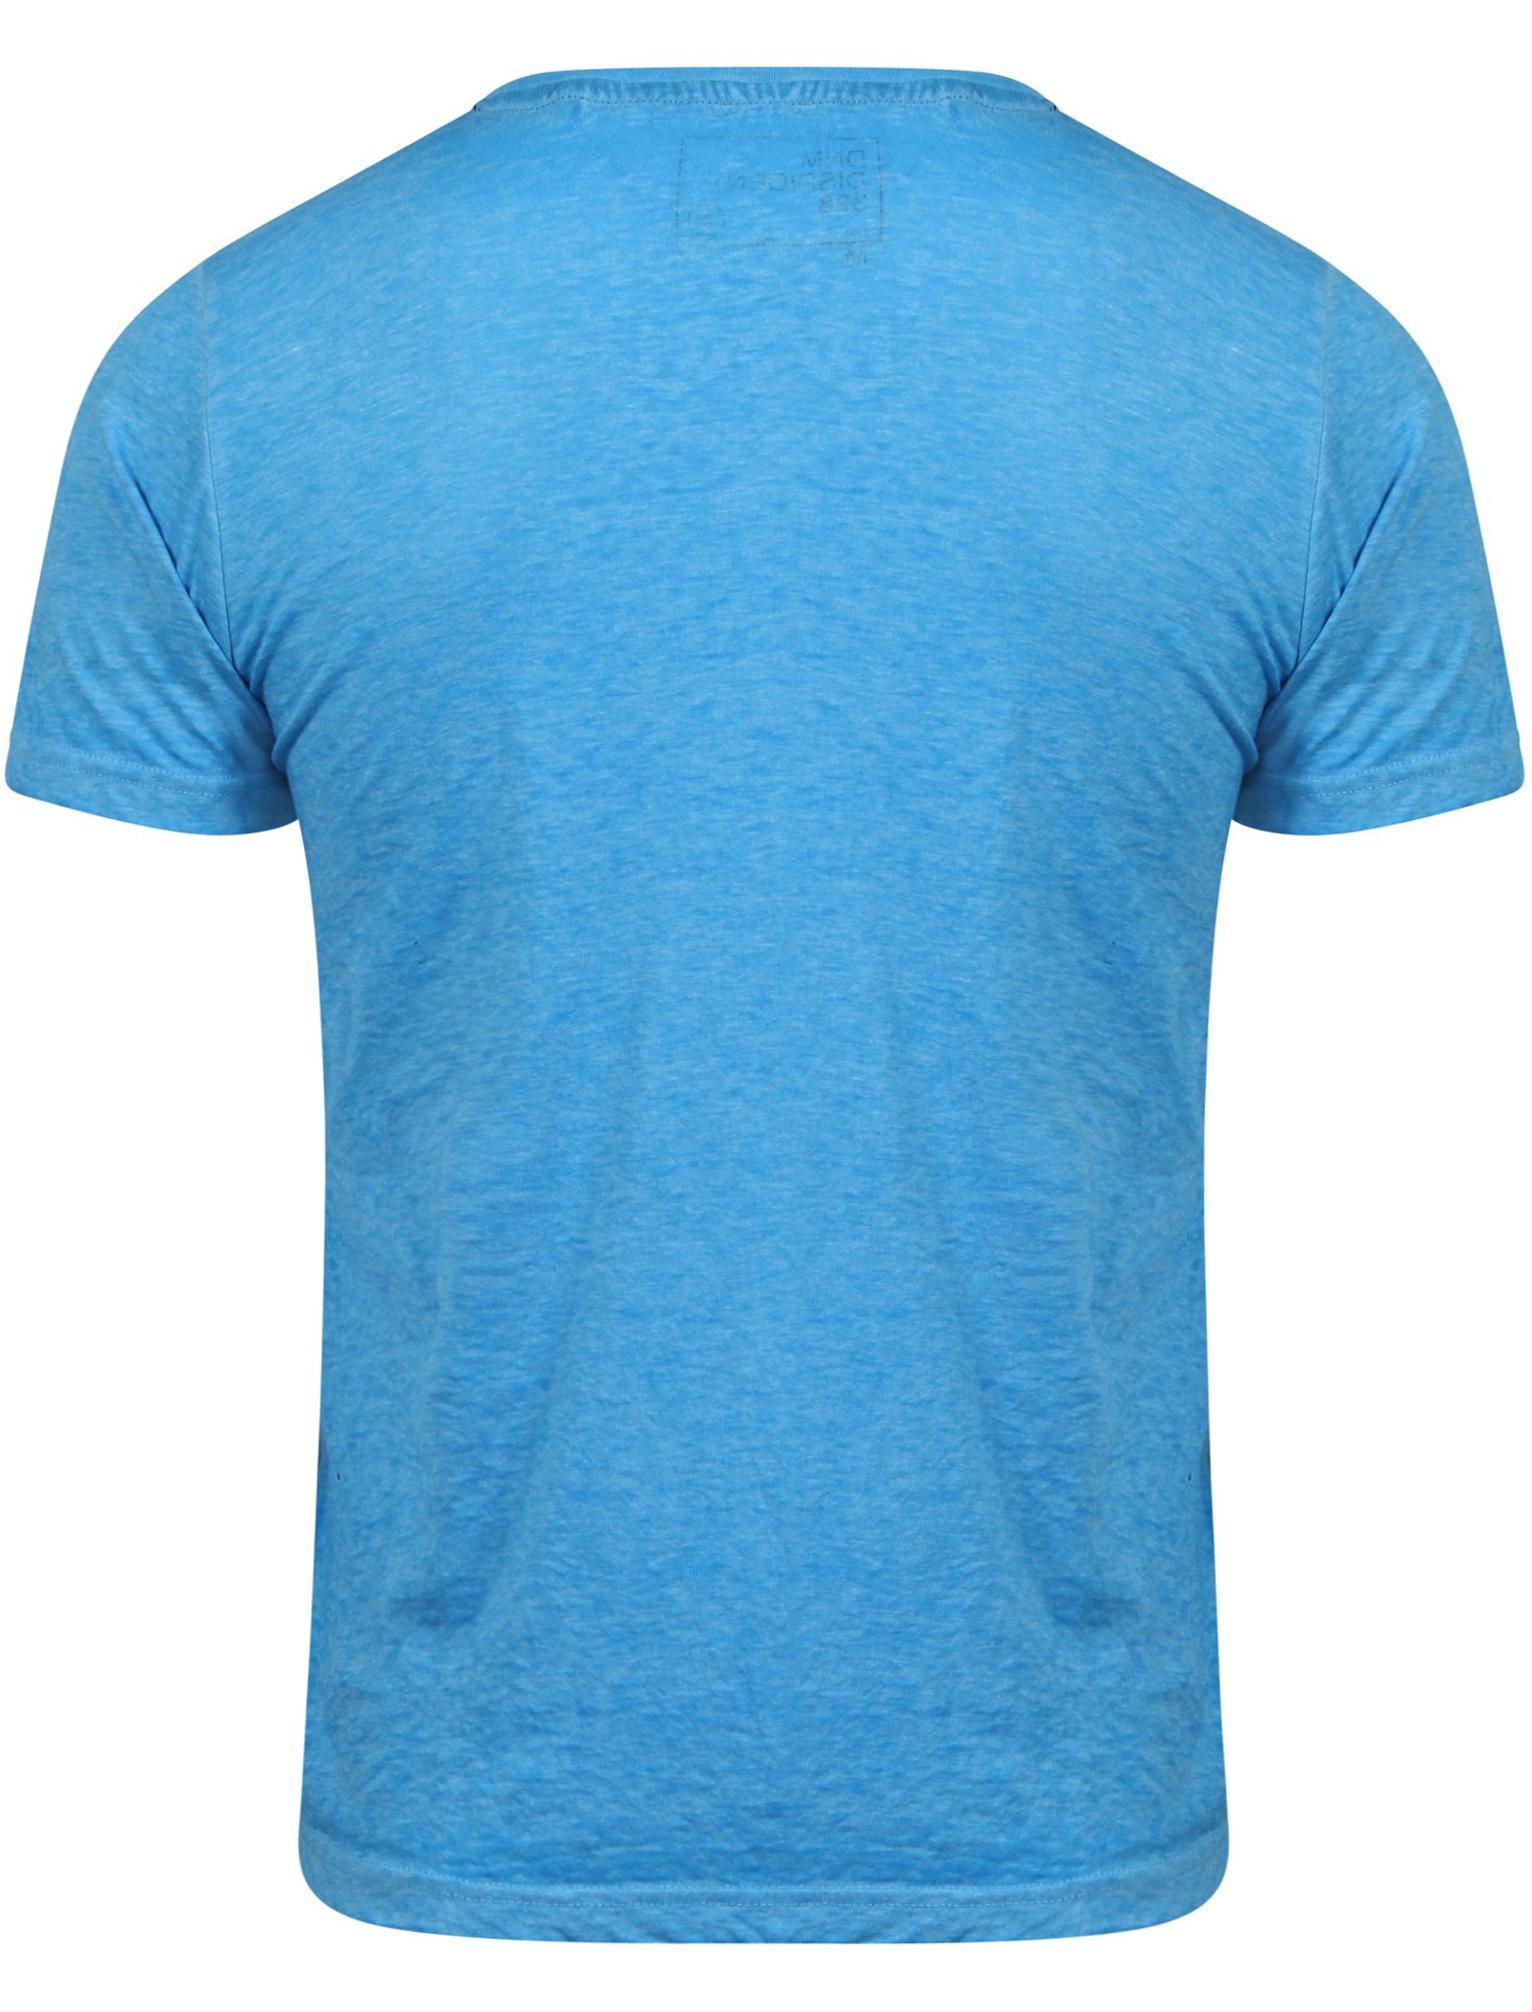 New-Mens-Dissident-Newburn-Motif-Burnout-V-Neck-Short-Sleeved-T-Shirt-Size-S-XXL